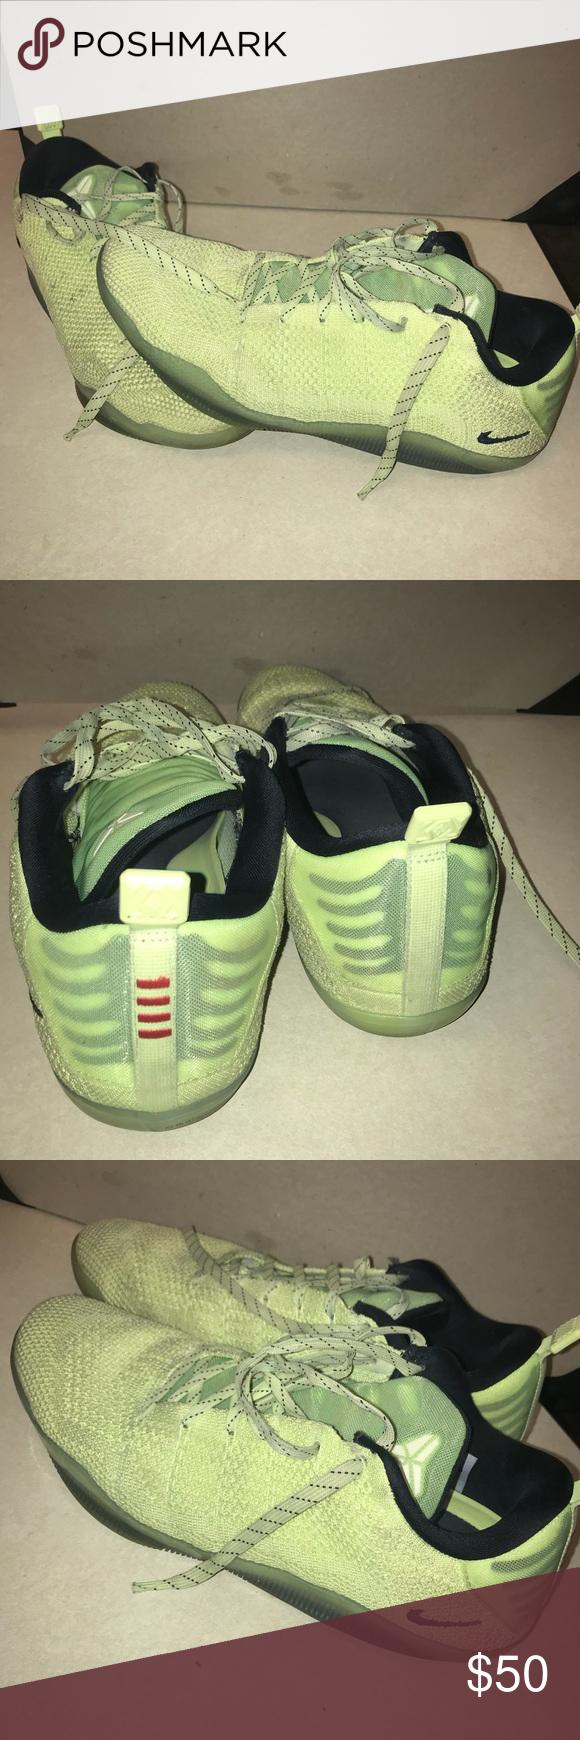 "97367e1f82b9 Nike Kobe 11 4kb ""liquid lime"" Nike Kobe 11 4kb ""liquid lime"" basketball  shoes Nike Shoes Athletic Shoes"